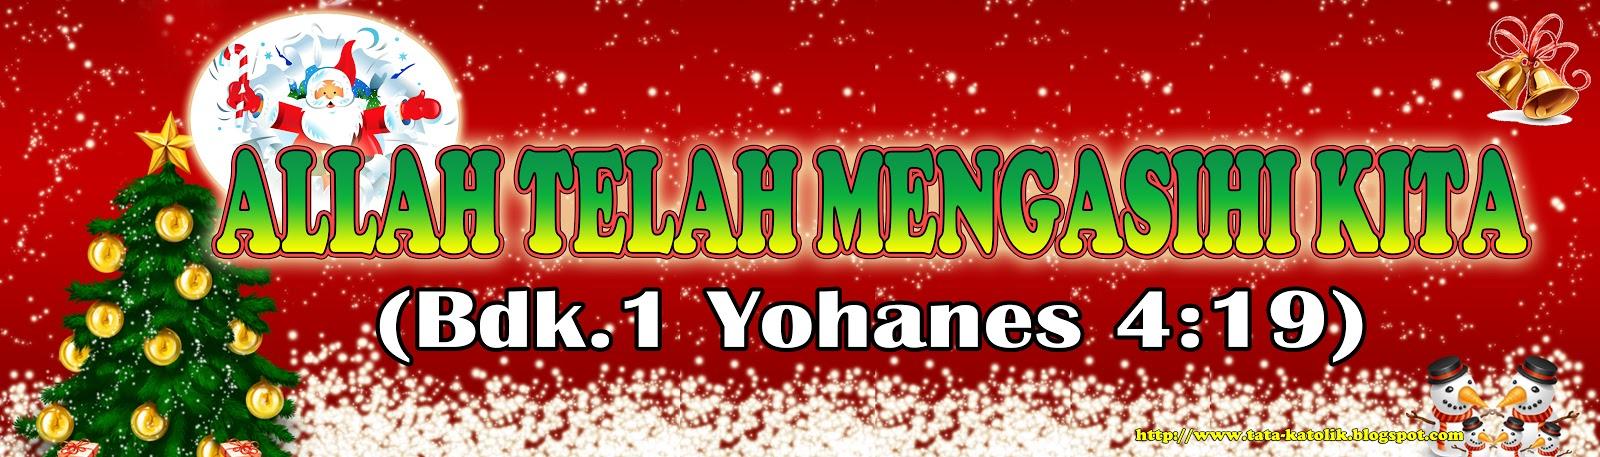 30 FREE DOWNLOAD GAMBAR SPANDUK NATAL SEKOLAH MINGGU CDR